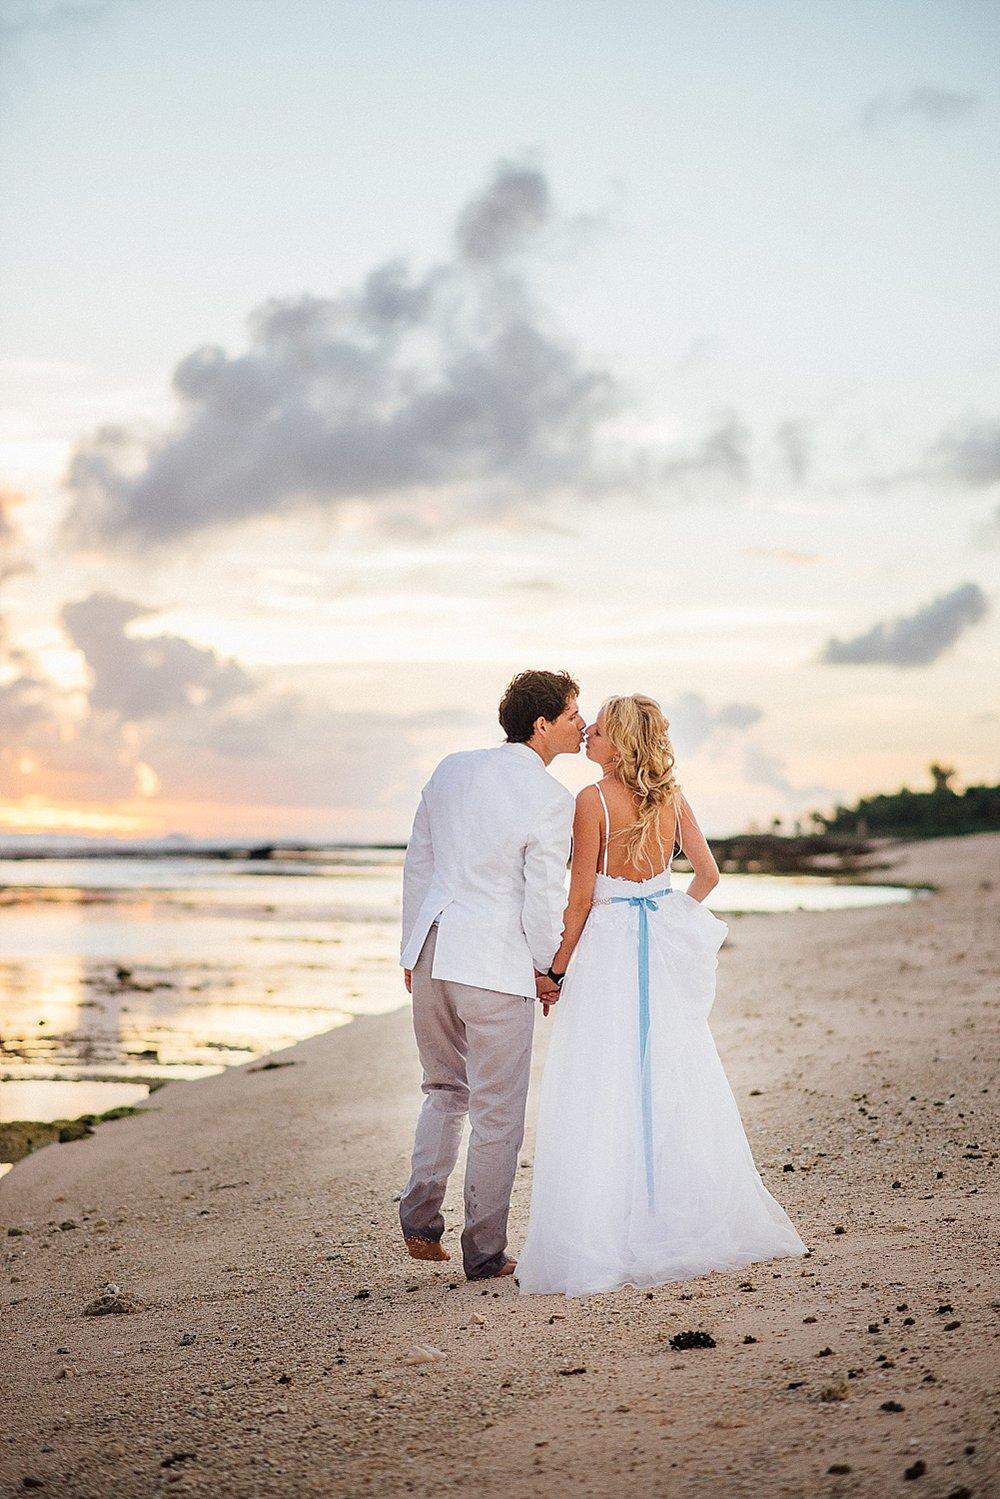 AnnaKyle-WeddingPhotography-TamanuOnTheBeach-VillaChampagne-GroovyBanana-VanuatuPhotographers_0028.jpg